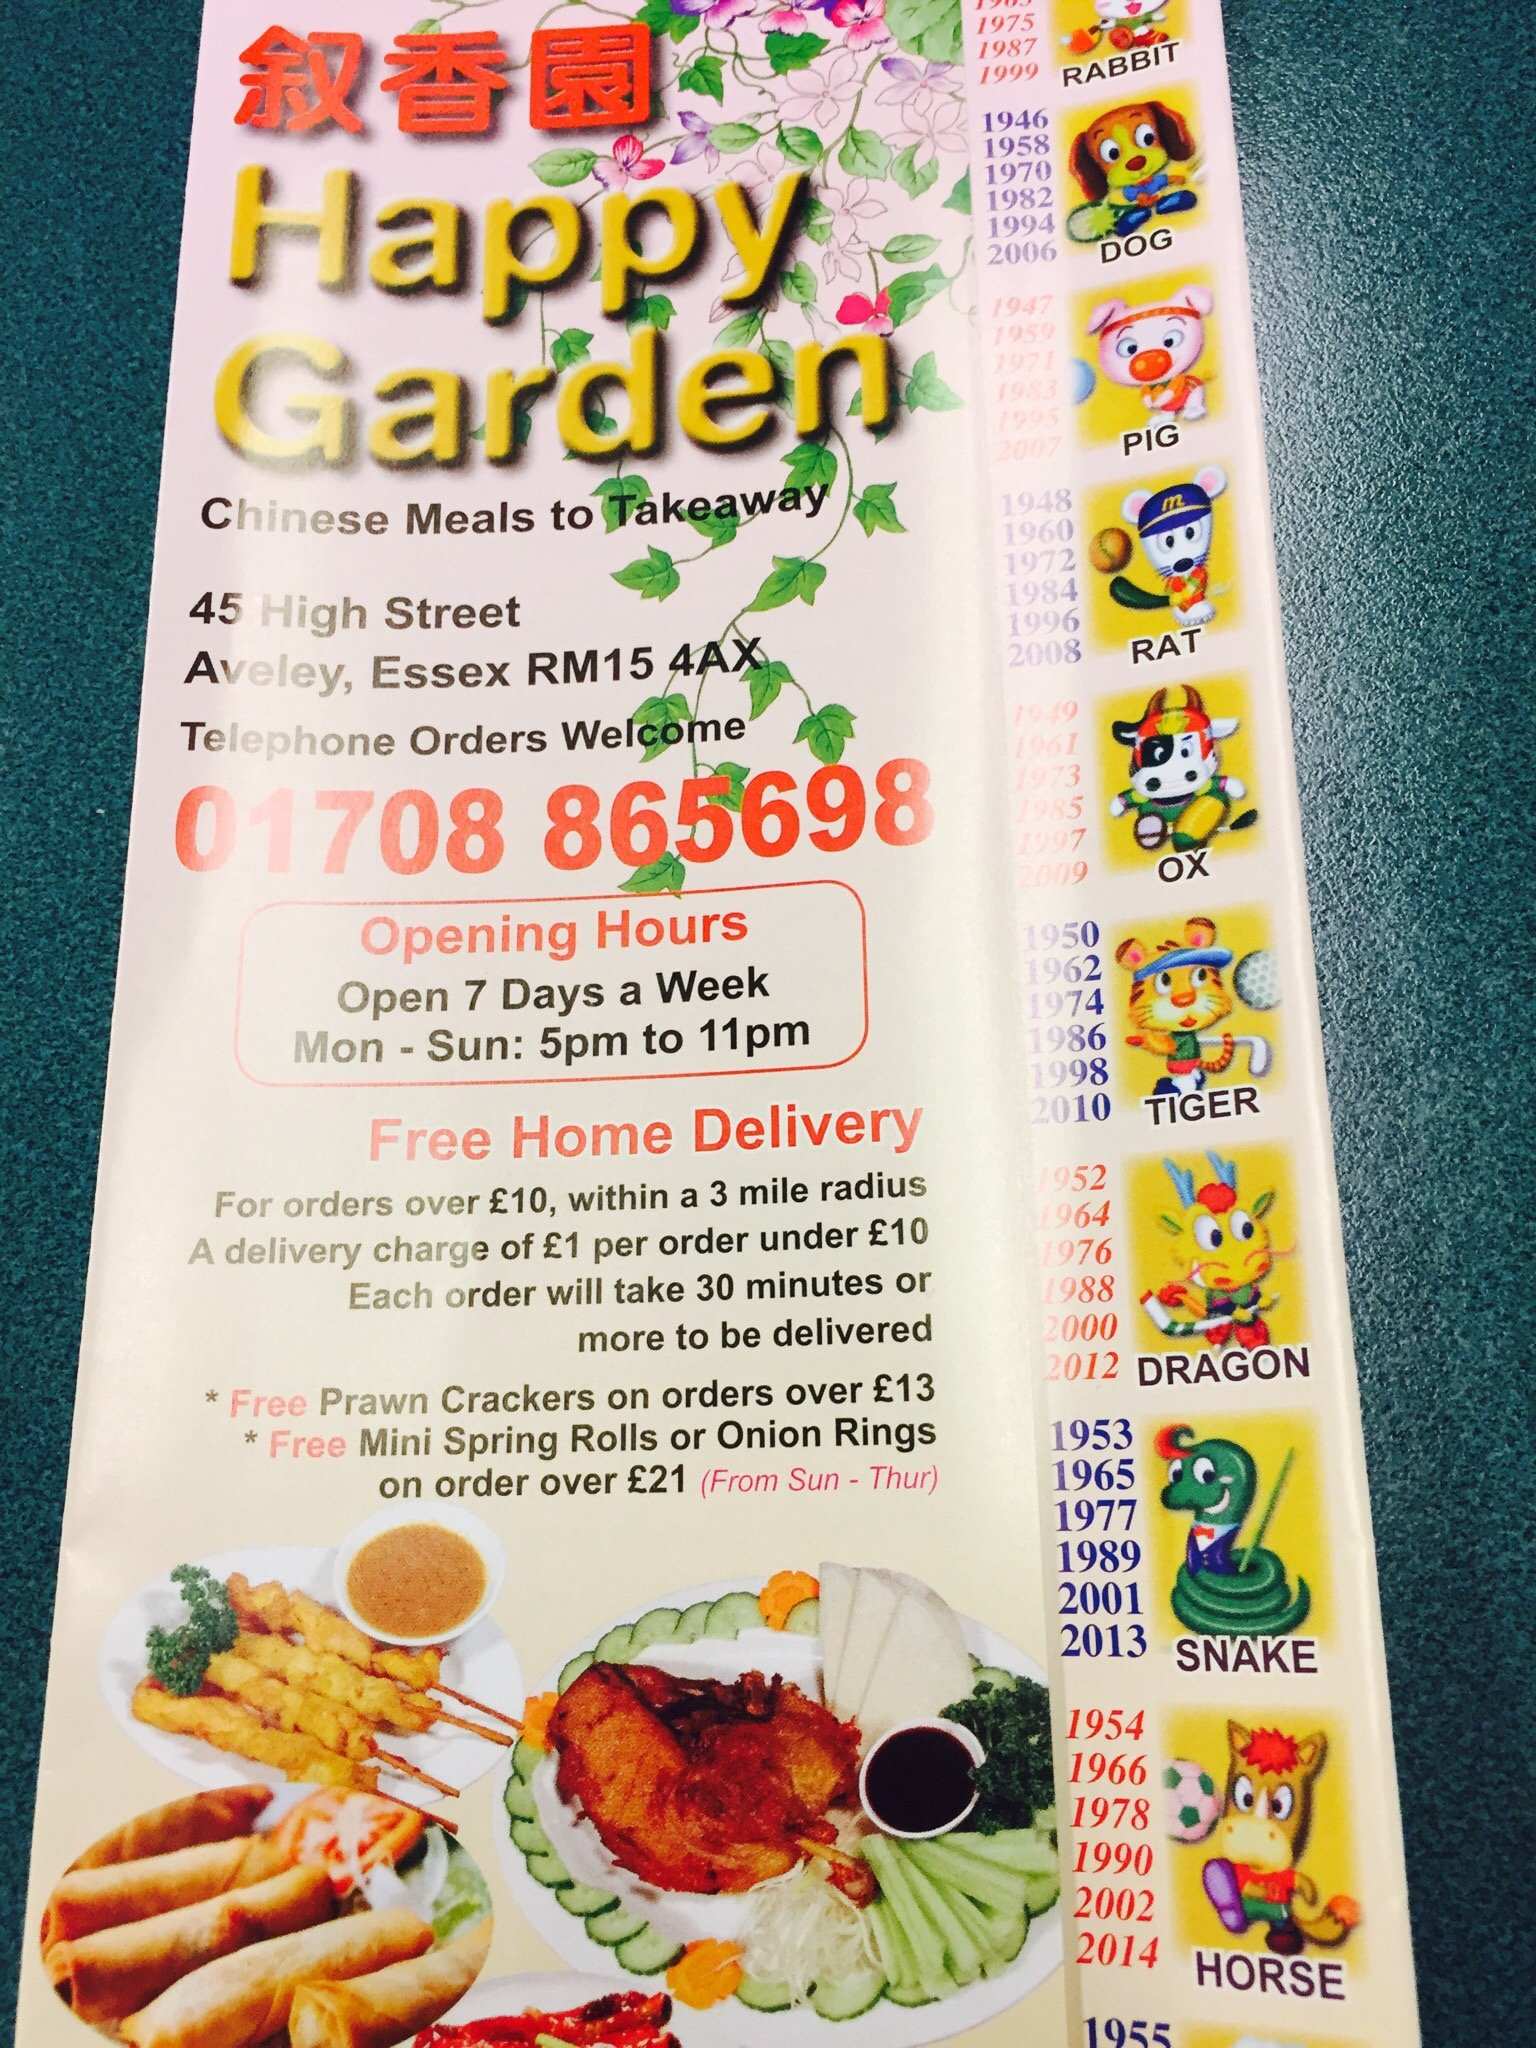 happy garden aveley 45 high st restaurant reviews photos